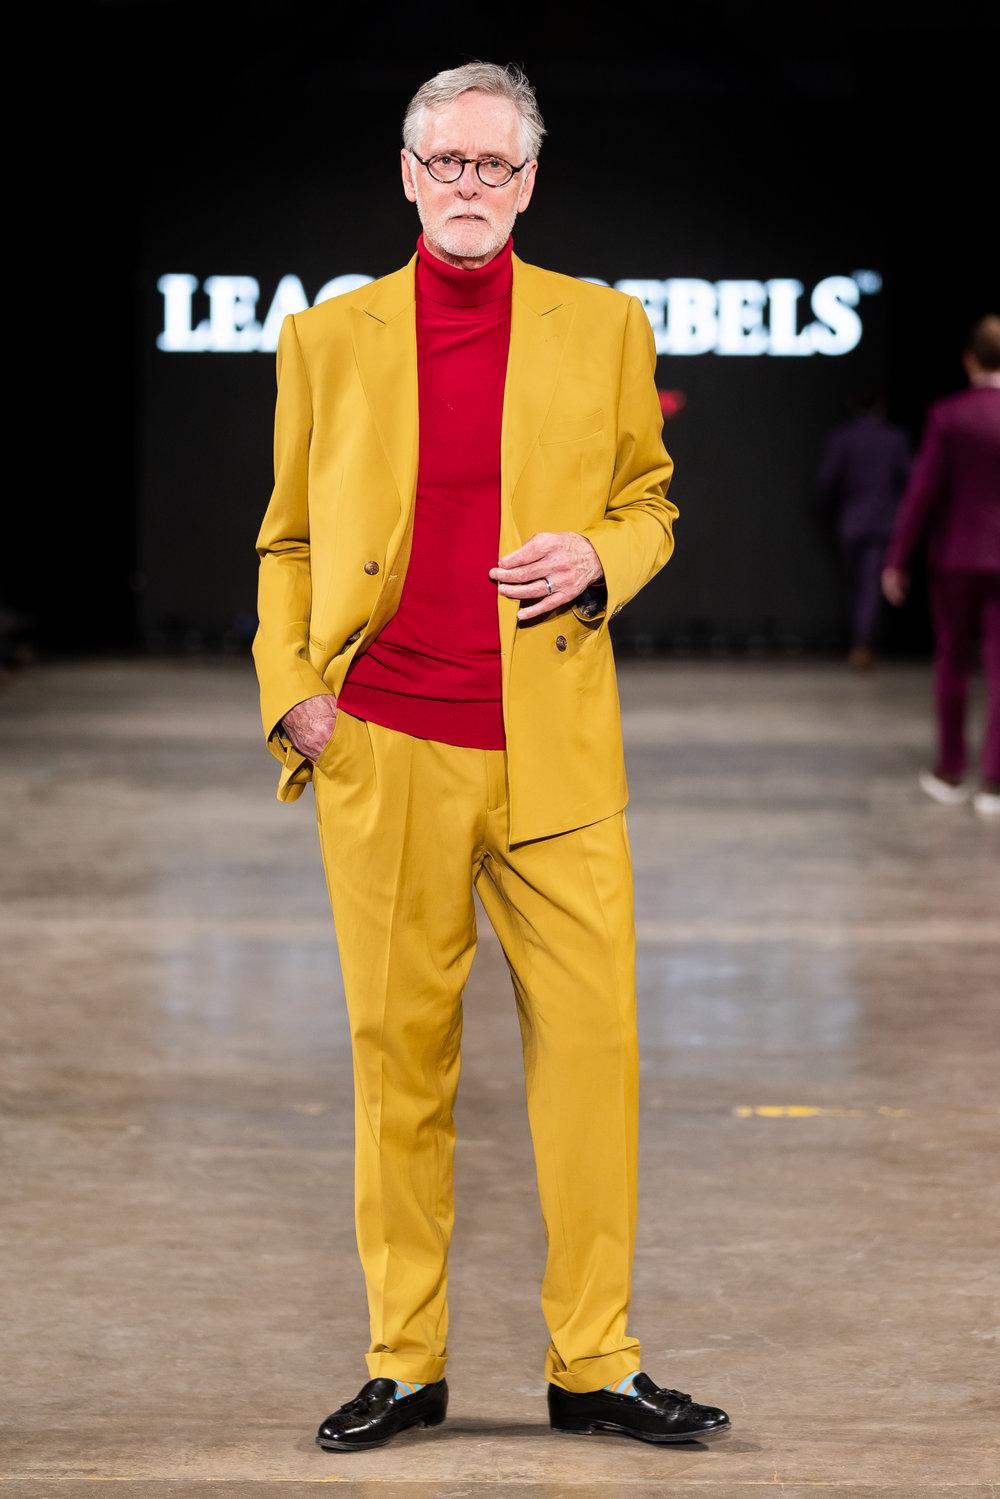 Austin Fashion Week Day 2 League of Rebels - MTM by Linn Images-29.jpg